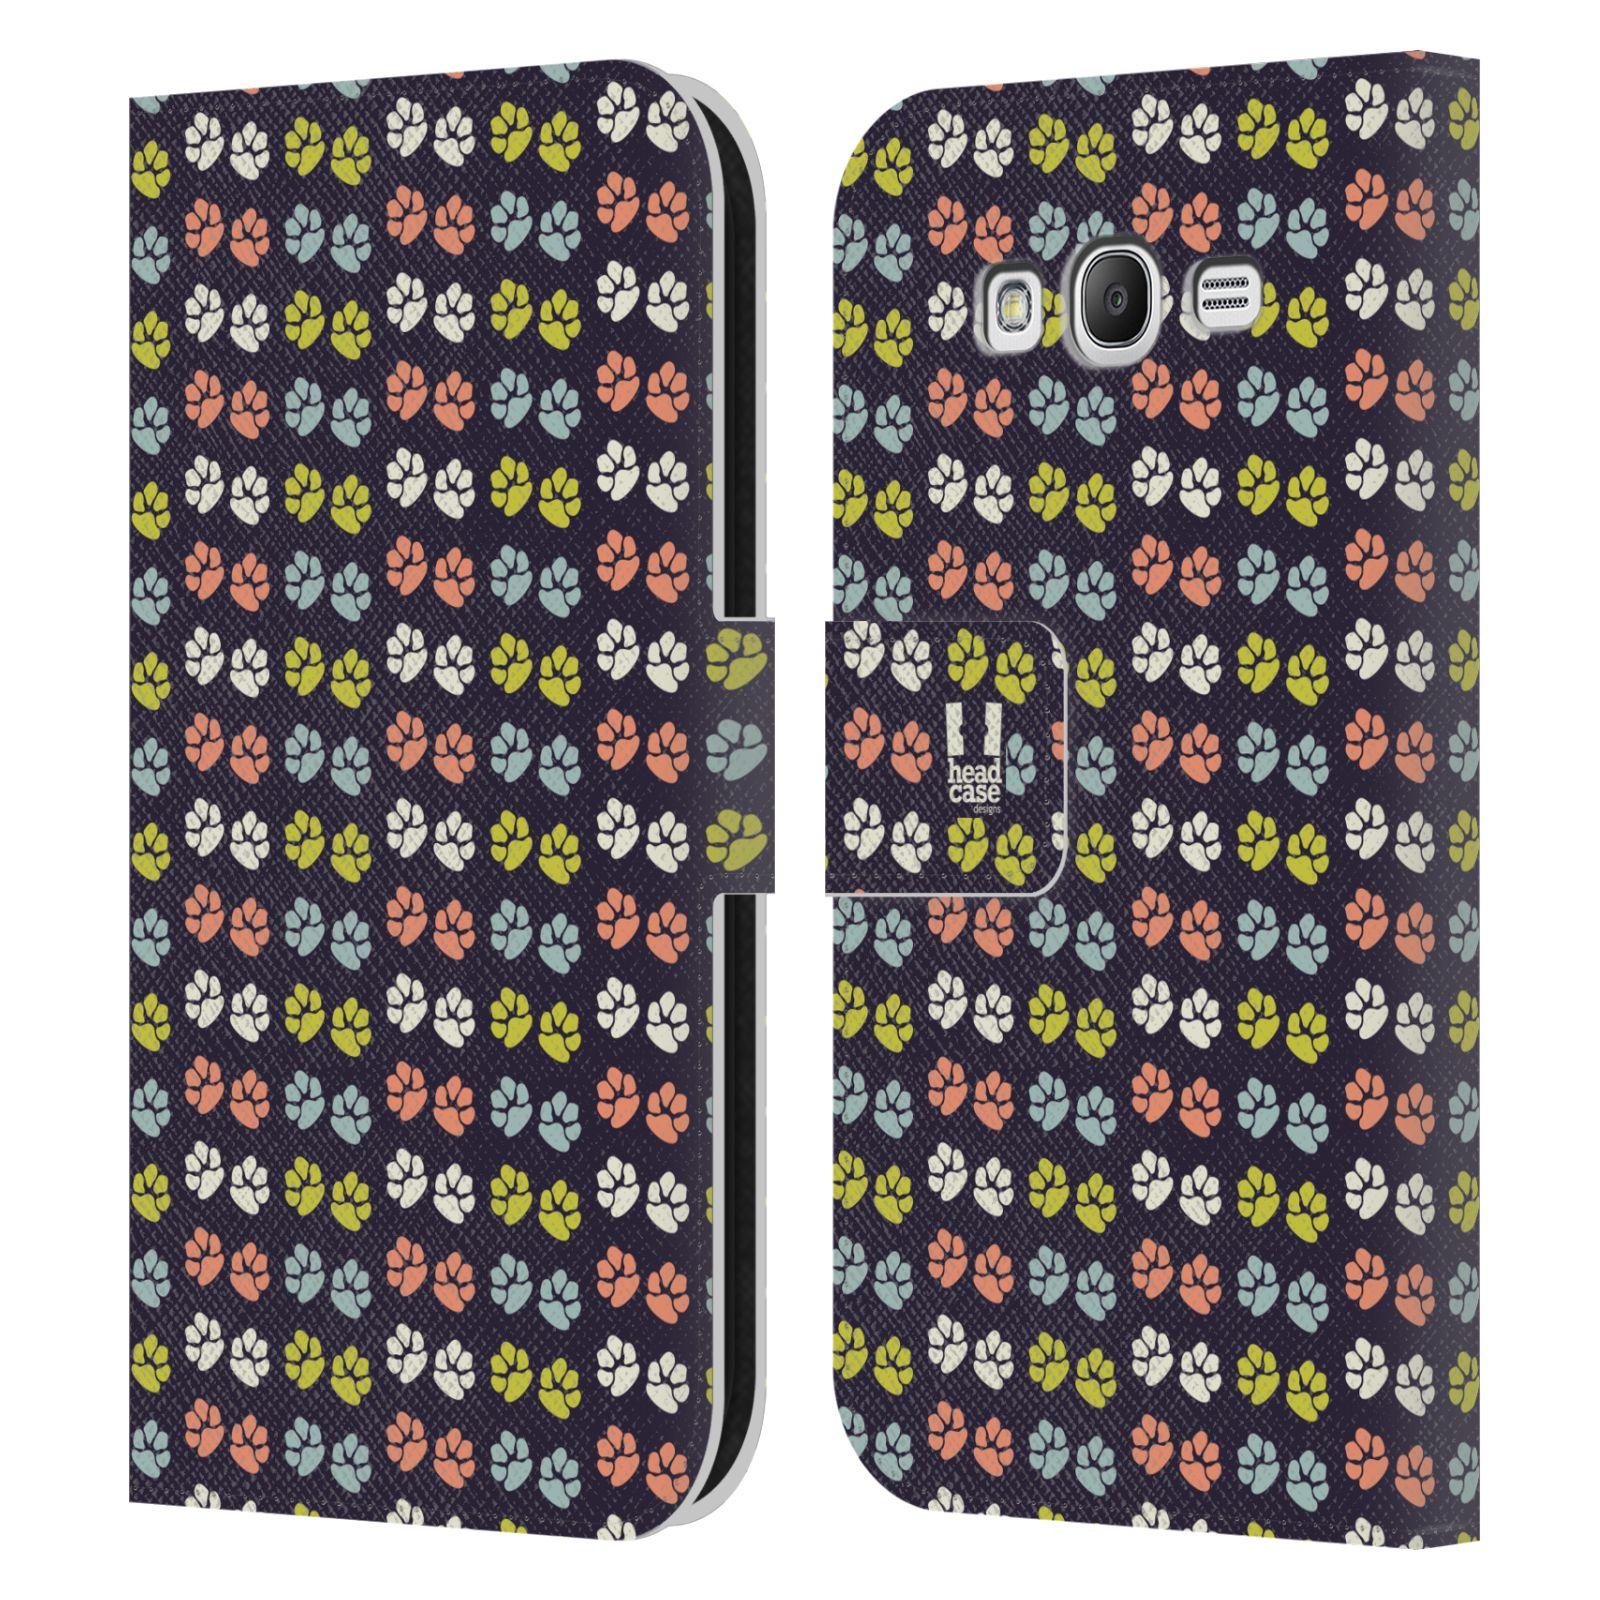 HEAD CASE Flipové pouzdro pro mobil Samsung Galaxy Grand i9080 Pejsek ťapky barevné RETRO